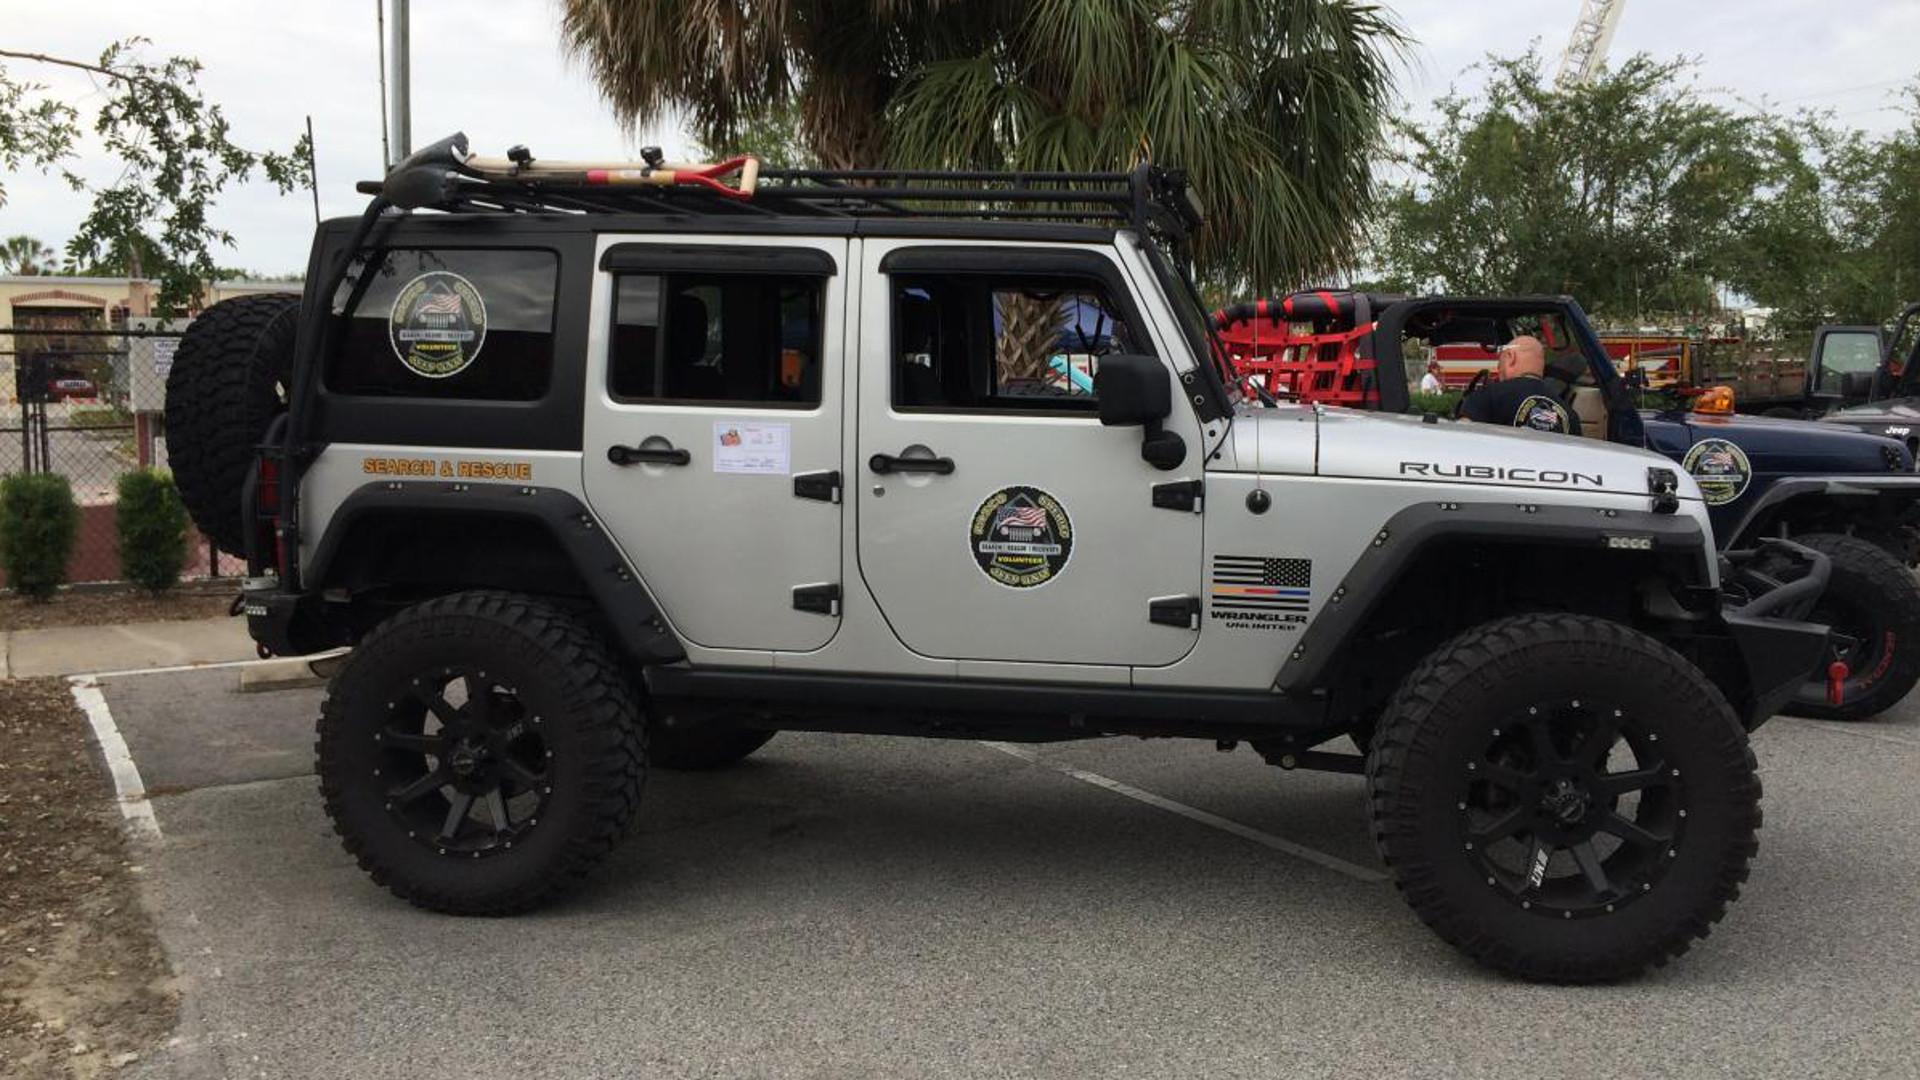 Florida Sheriff Organizes Jeep Wrangler Volunteer Squad for Search